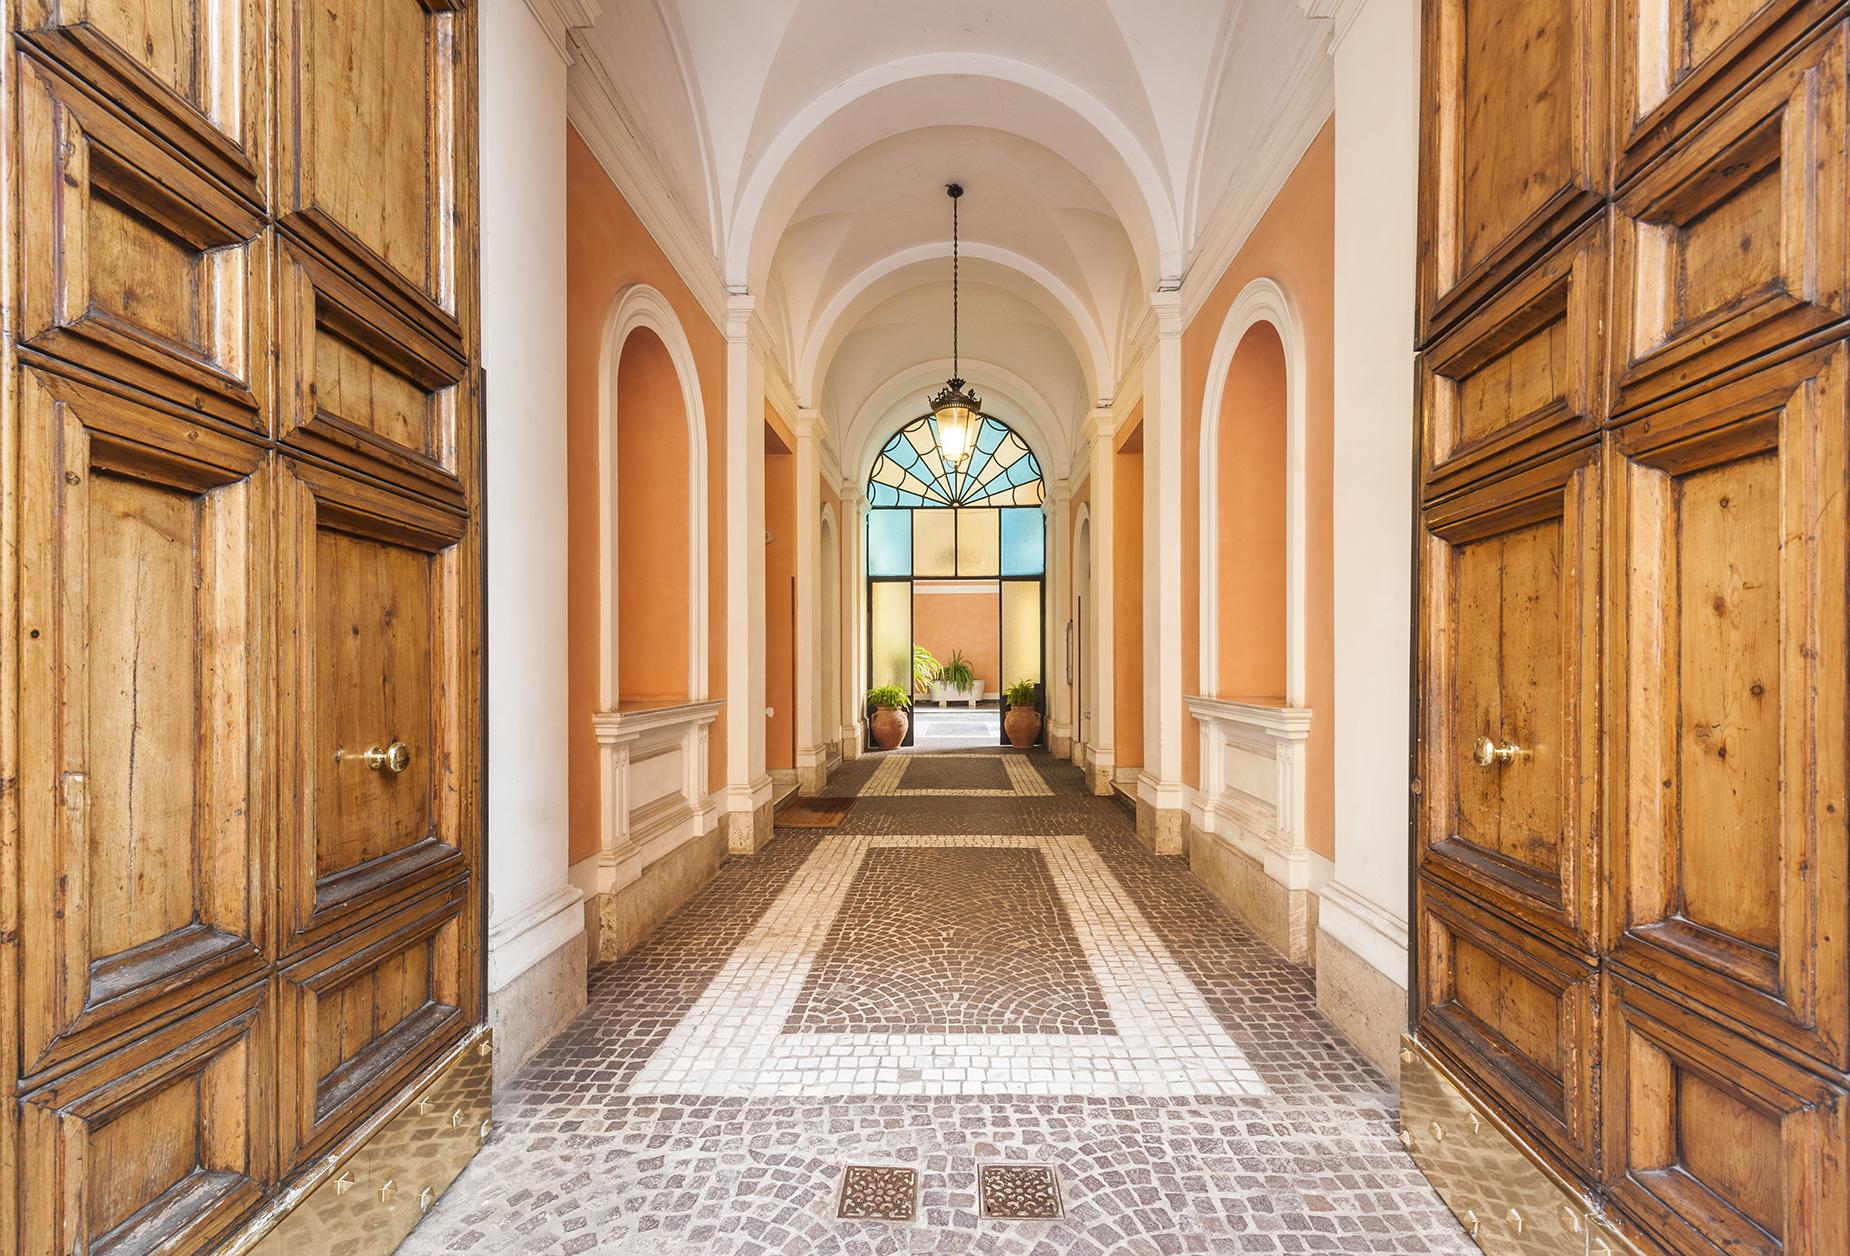 Appartement pour l Vente à Elegant and bright apartment in the Sallustiano district Via Piave Rome, Rome 00187 Italie